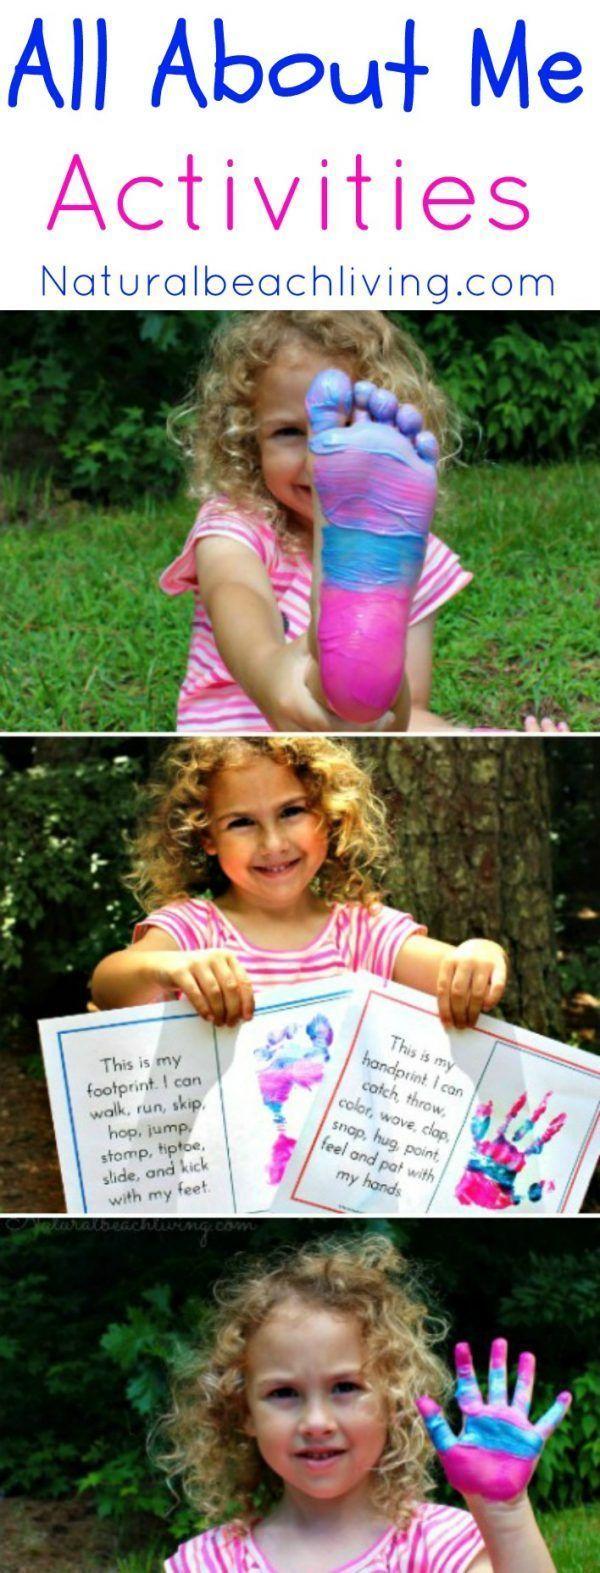 All About Me Activity Theme for Preschool & Kindergarten - Natural Beach Living